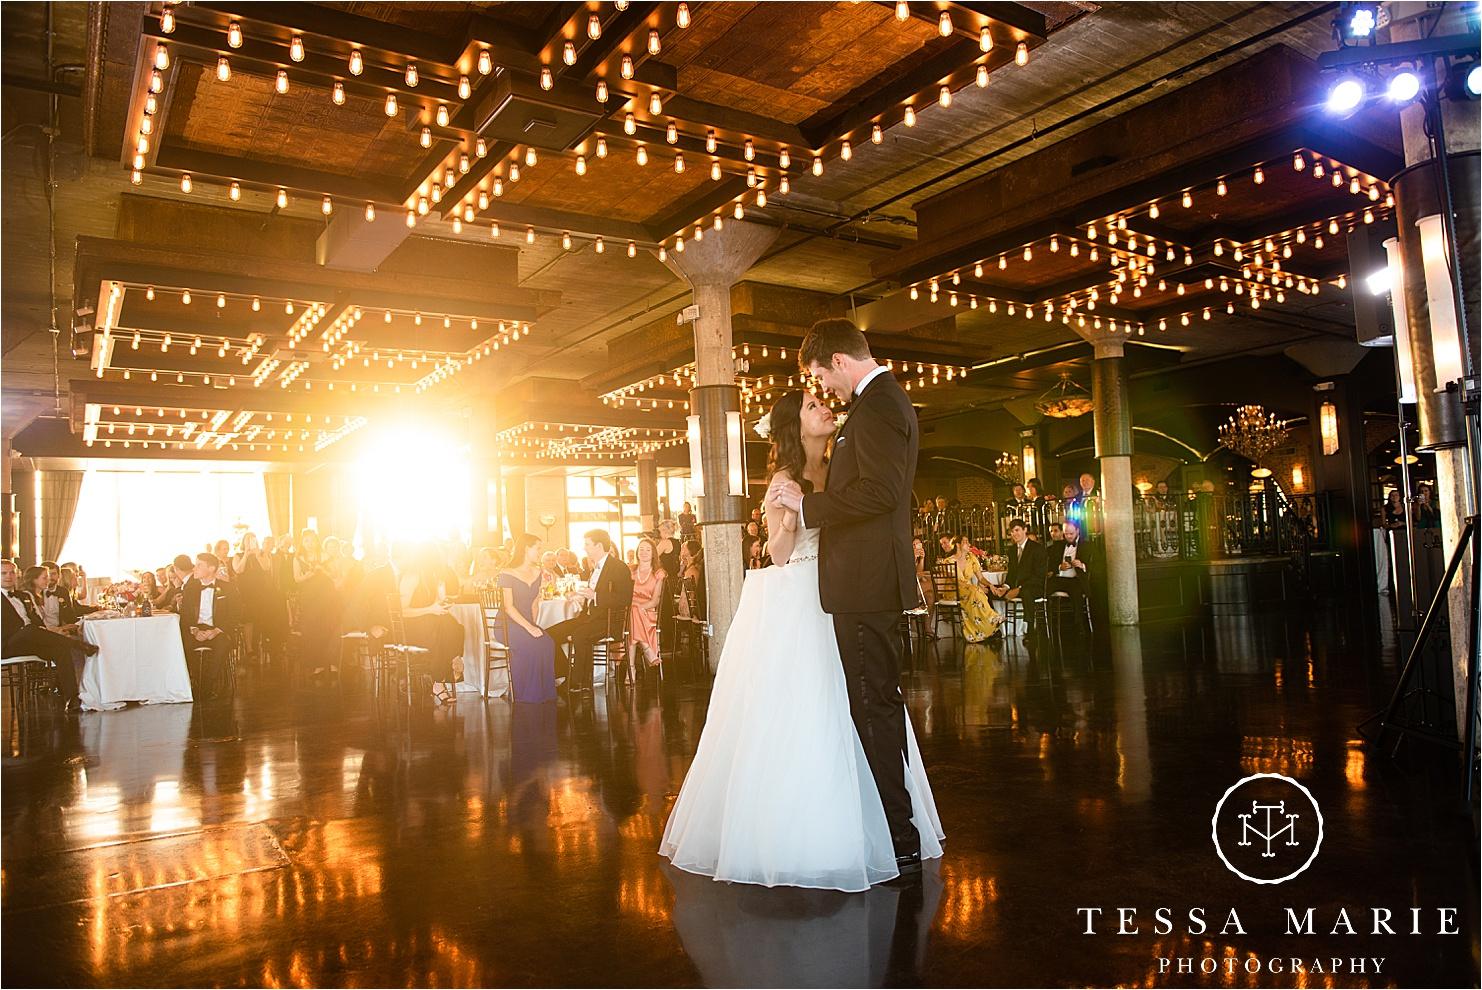 Tessa_marie_weddings_houston_wedding_photographer_The_astorian_0149.jpg